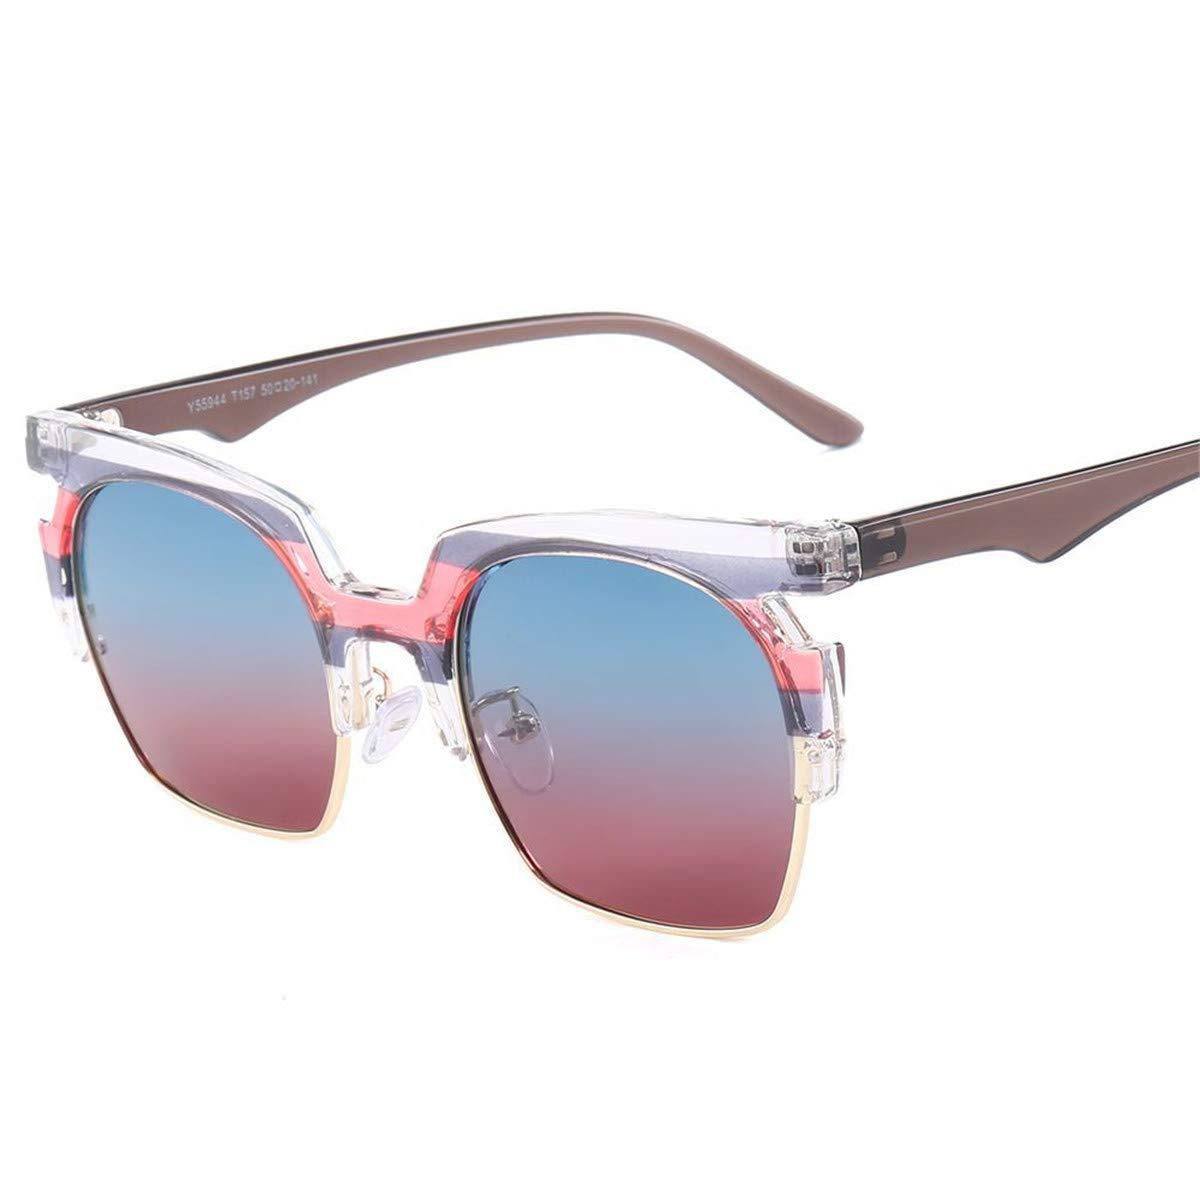 KOMNY Moda Gafas de Sol polarizadas Hombres Mujeres Conducción Gafas de Sol Male Square Glasses Polaroid UV400 zonnebril mannen G55944, E: Amazon.es: Hogar